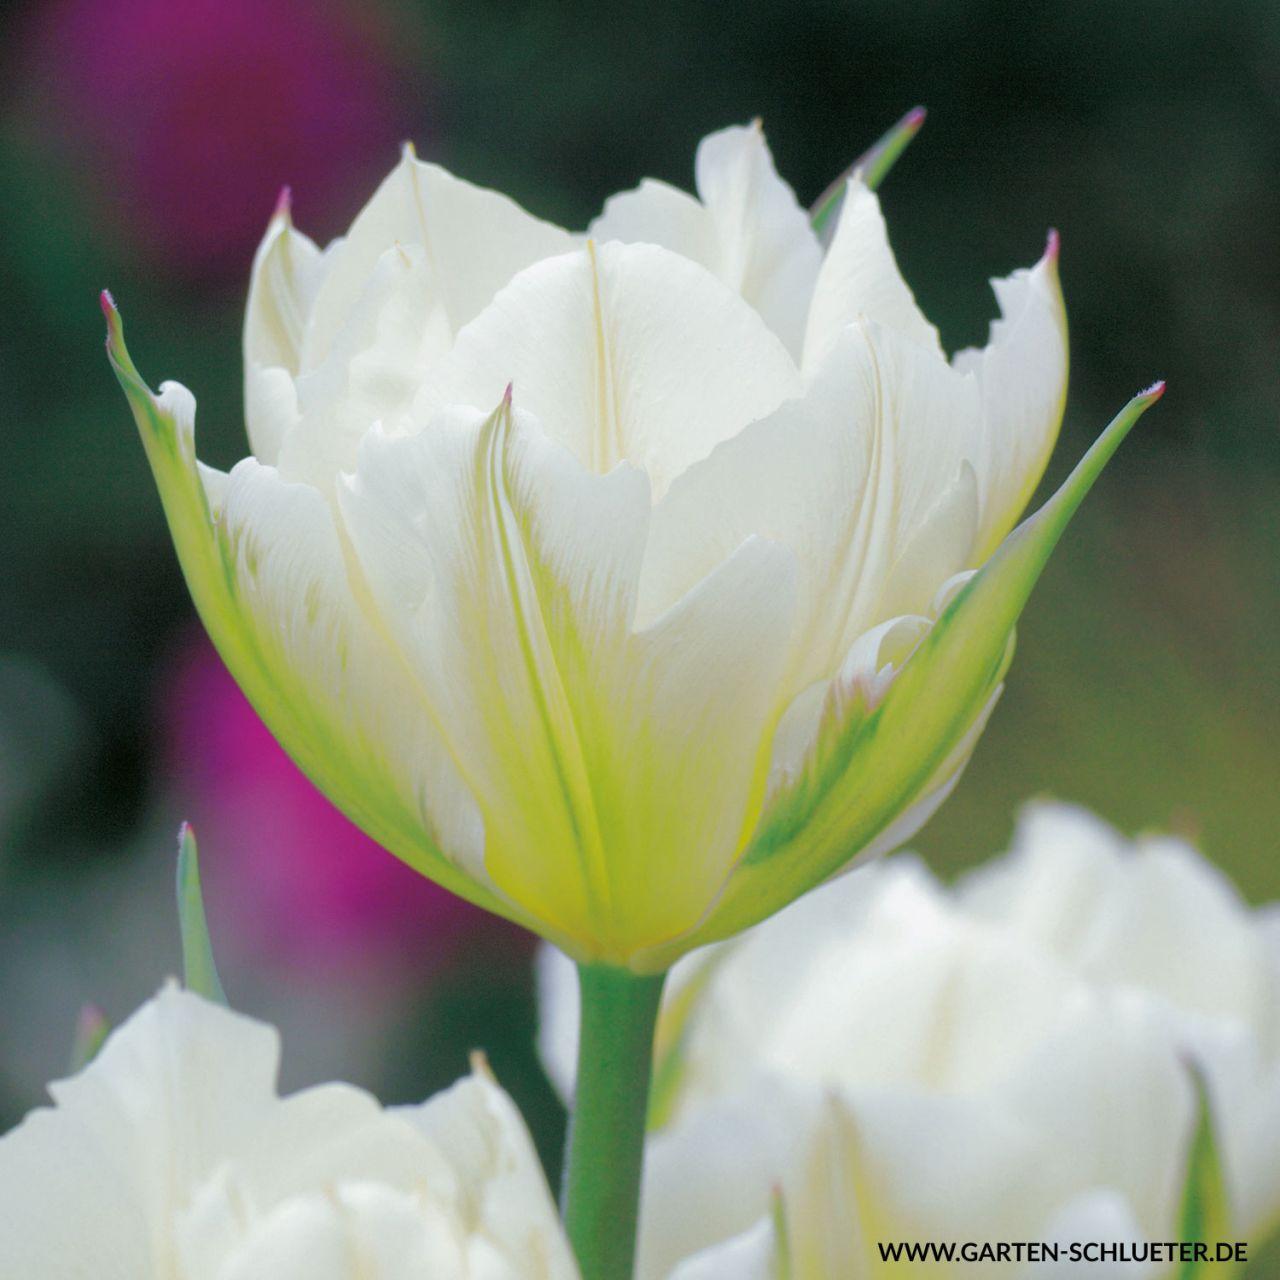 Garten-Schlueter.de: Fosteriana Tulpe Exotic Emperor - 7 Stück